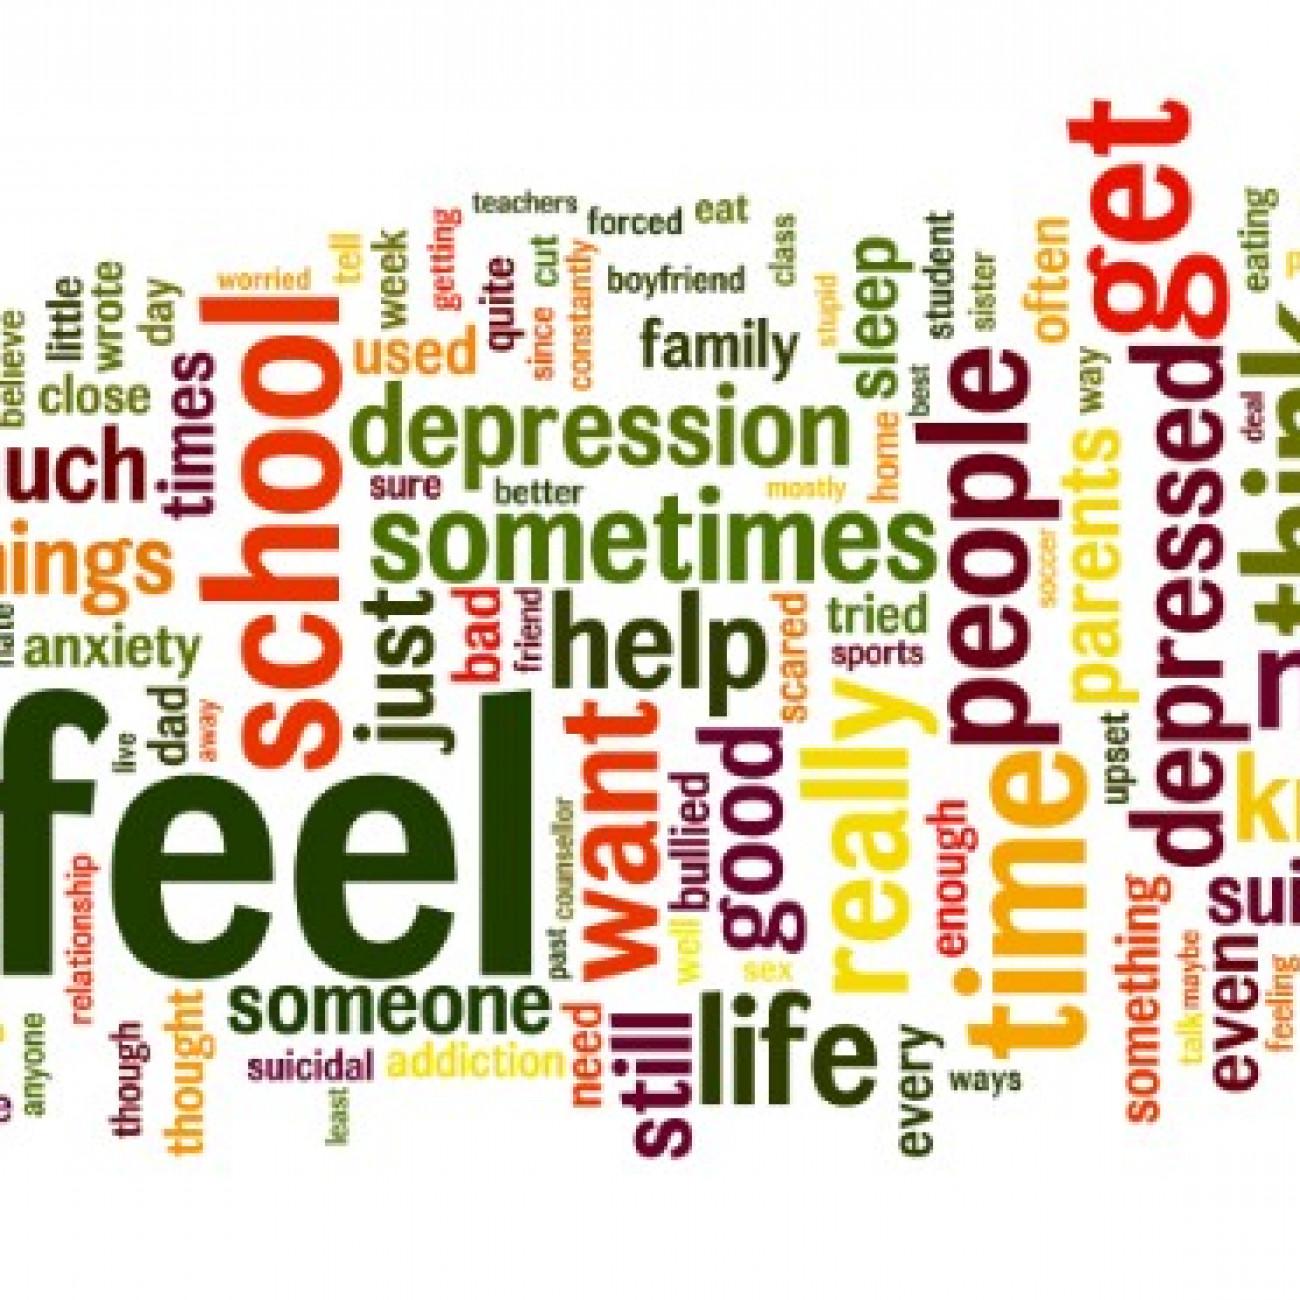 Mental health images (list)